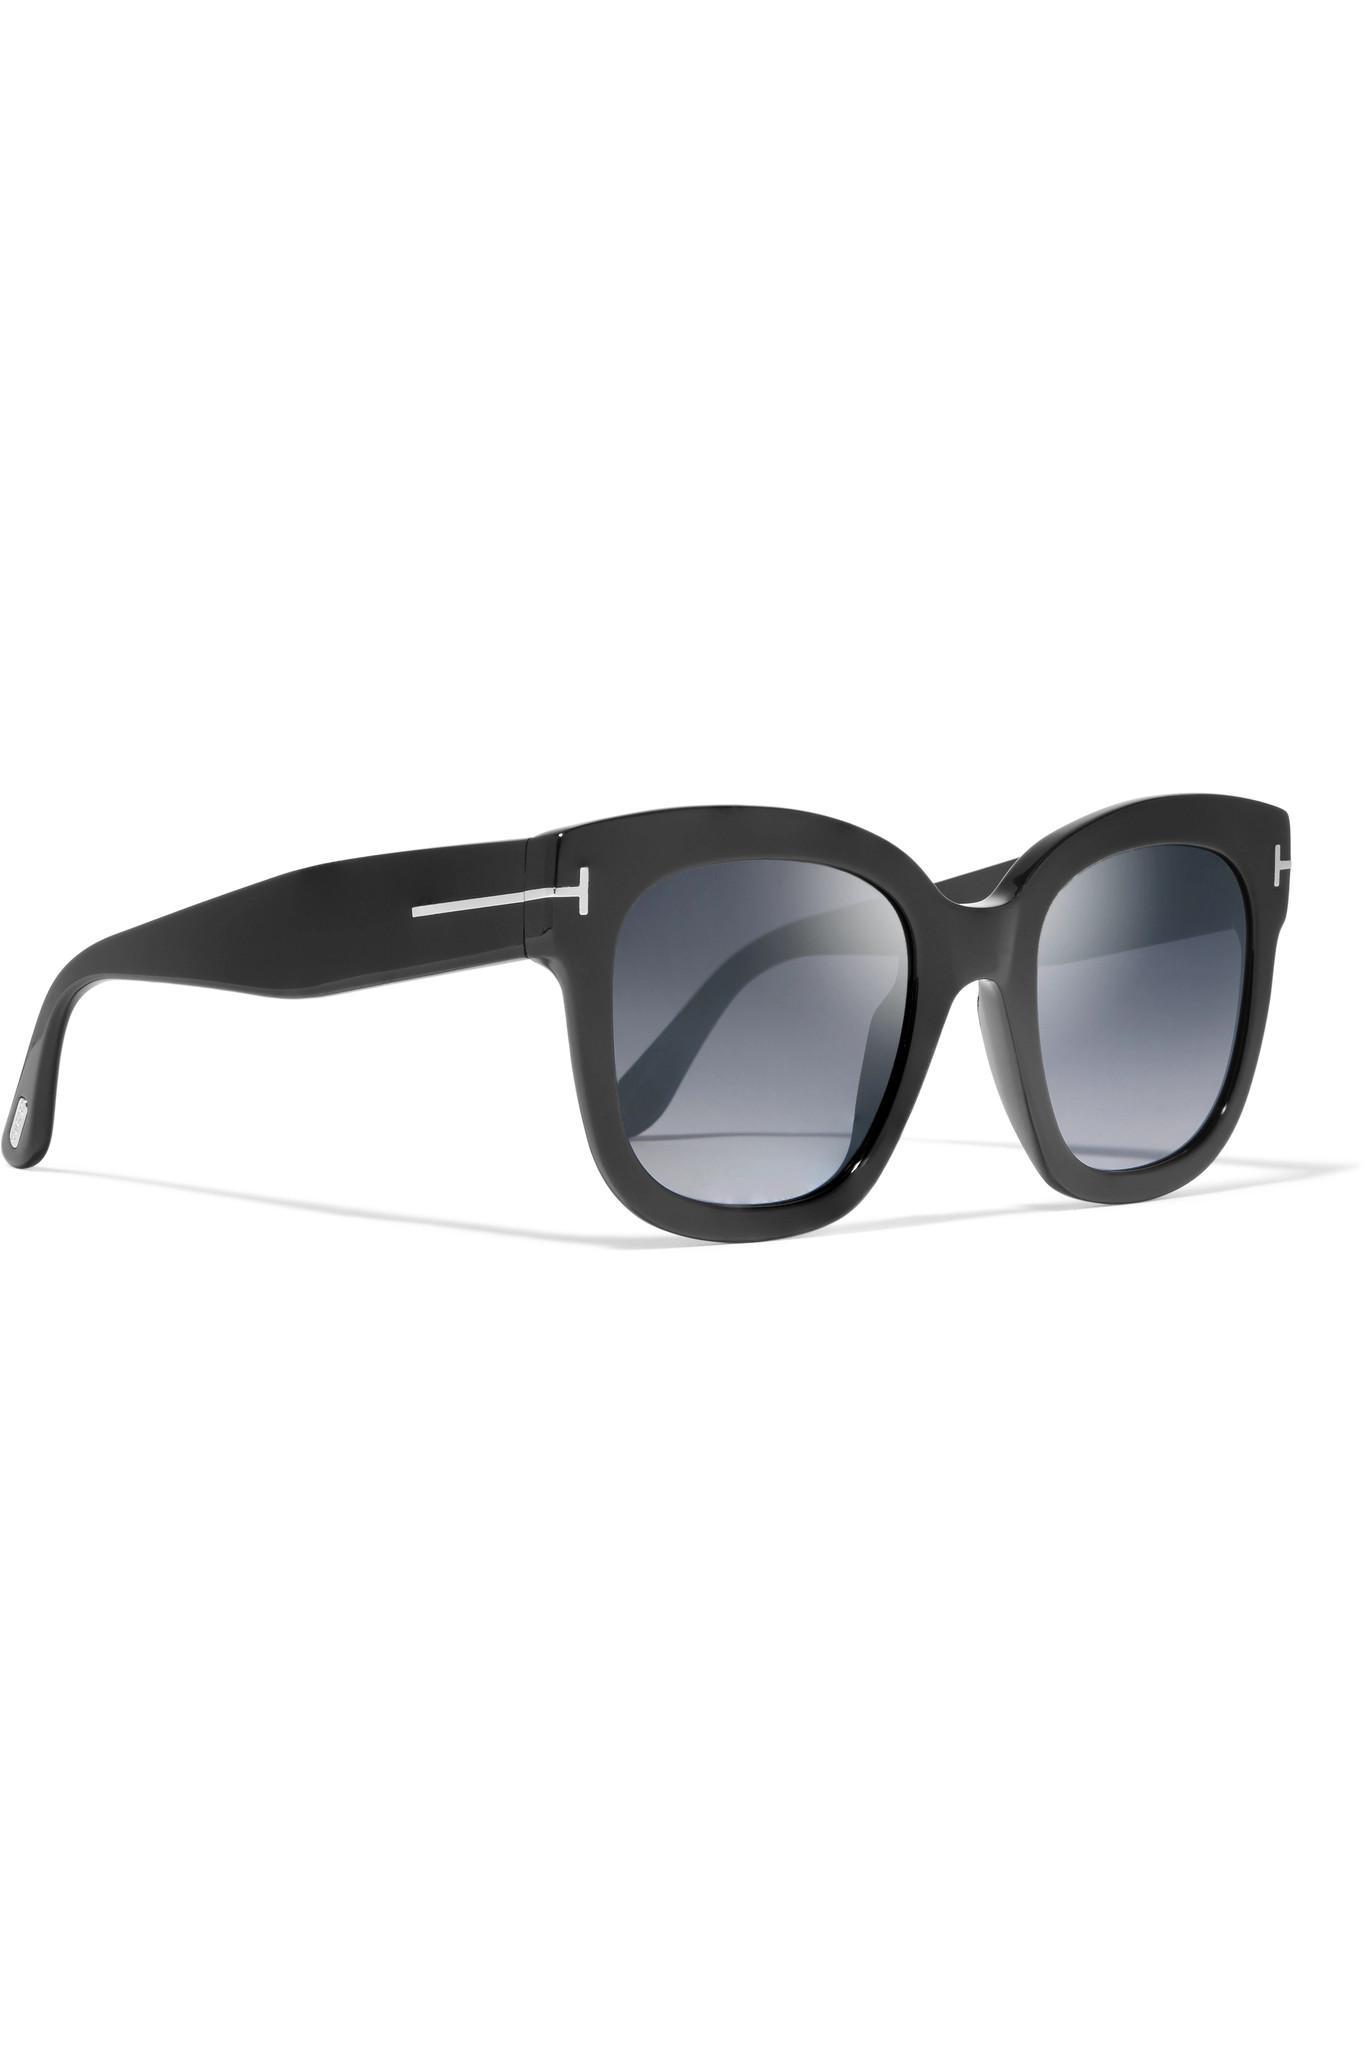 305832464f6c2 Tom Ford - Black Cat-eye Acetate Sunglasses - Lyst. View fullscreen